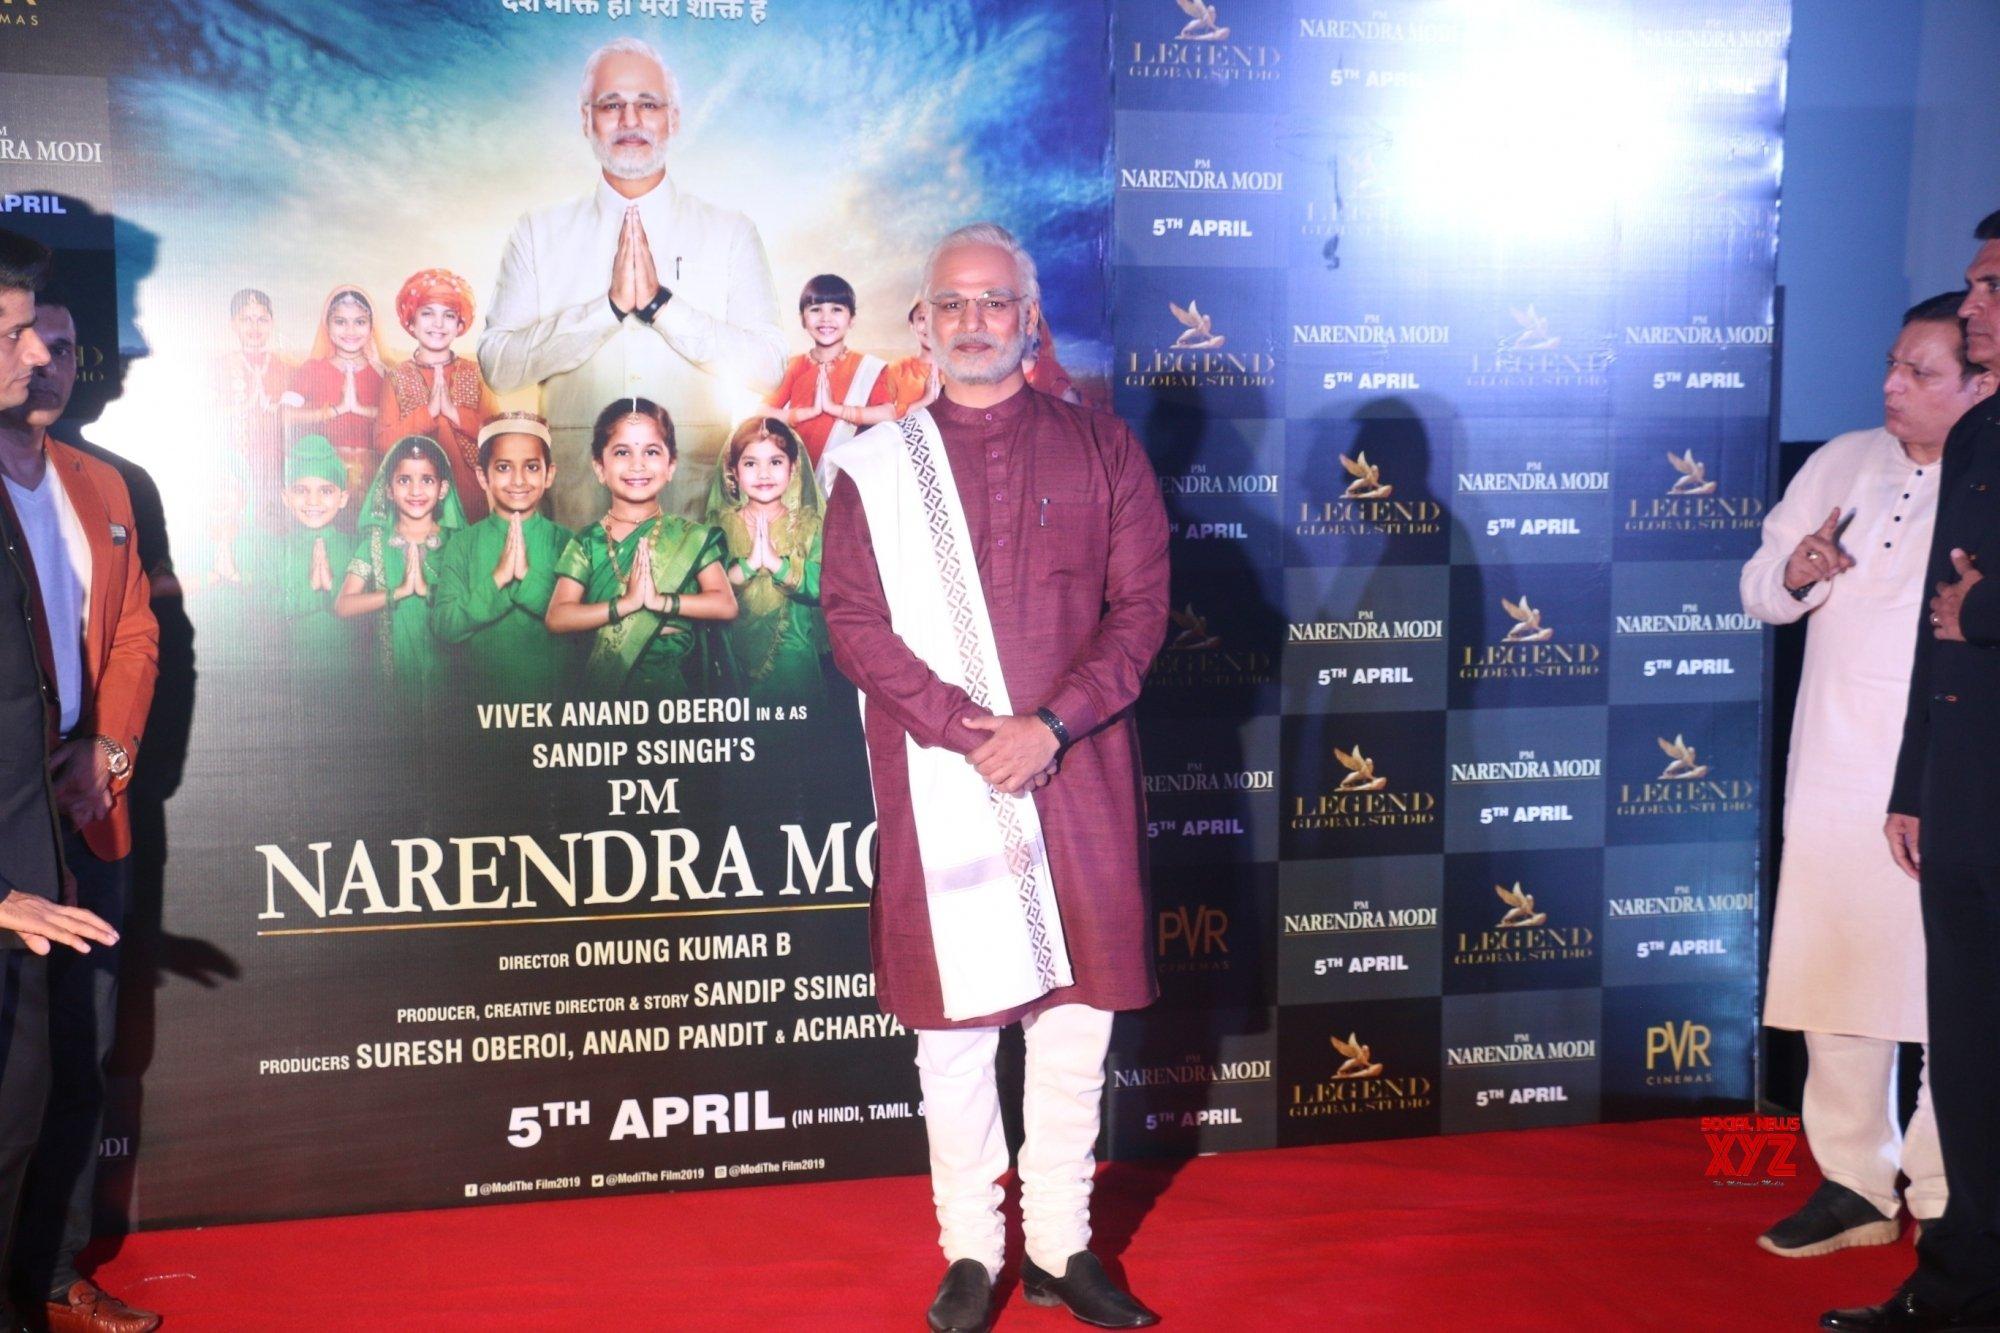 SC on Modi biopic: EC to watch film, submit report